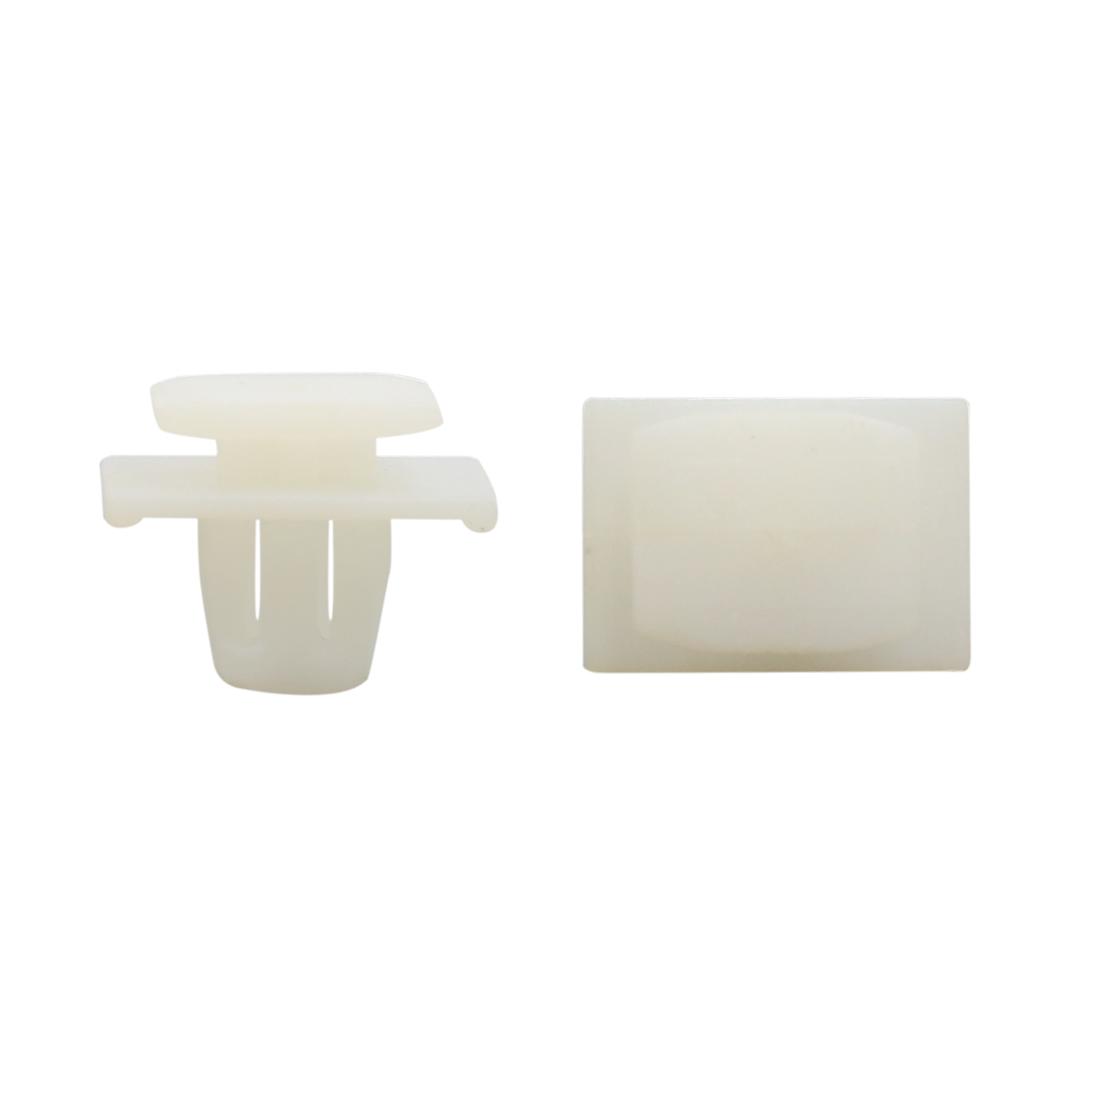 50Pcs Black Plastic 11mm x 10mm Hole Screw Fastener Rivet Retainers Hood Clip